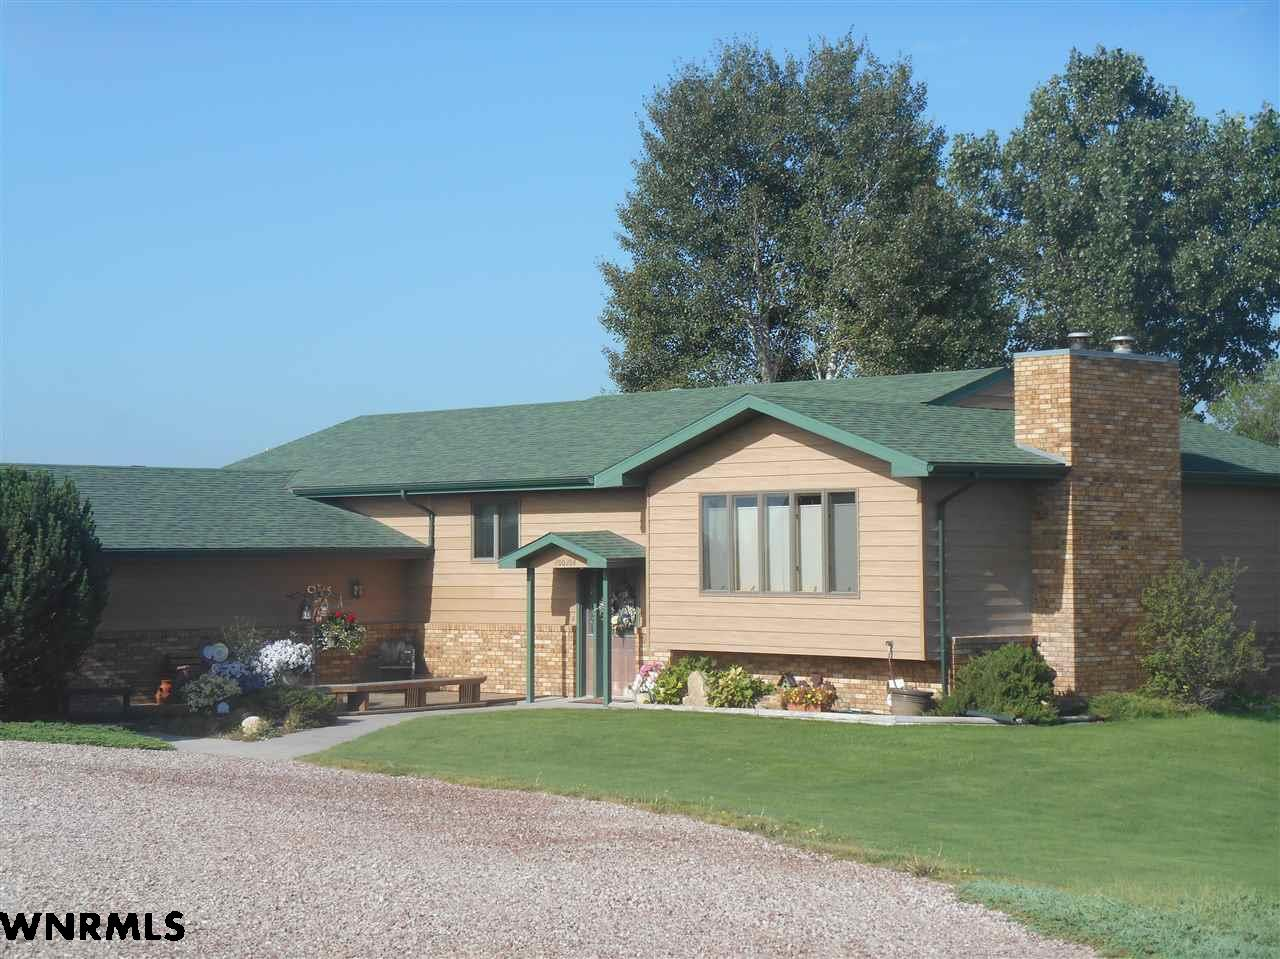 200208 ROLLING HILLS RD, Scottsbluff, NE 69361